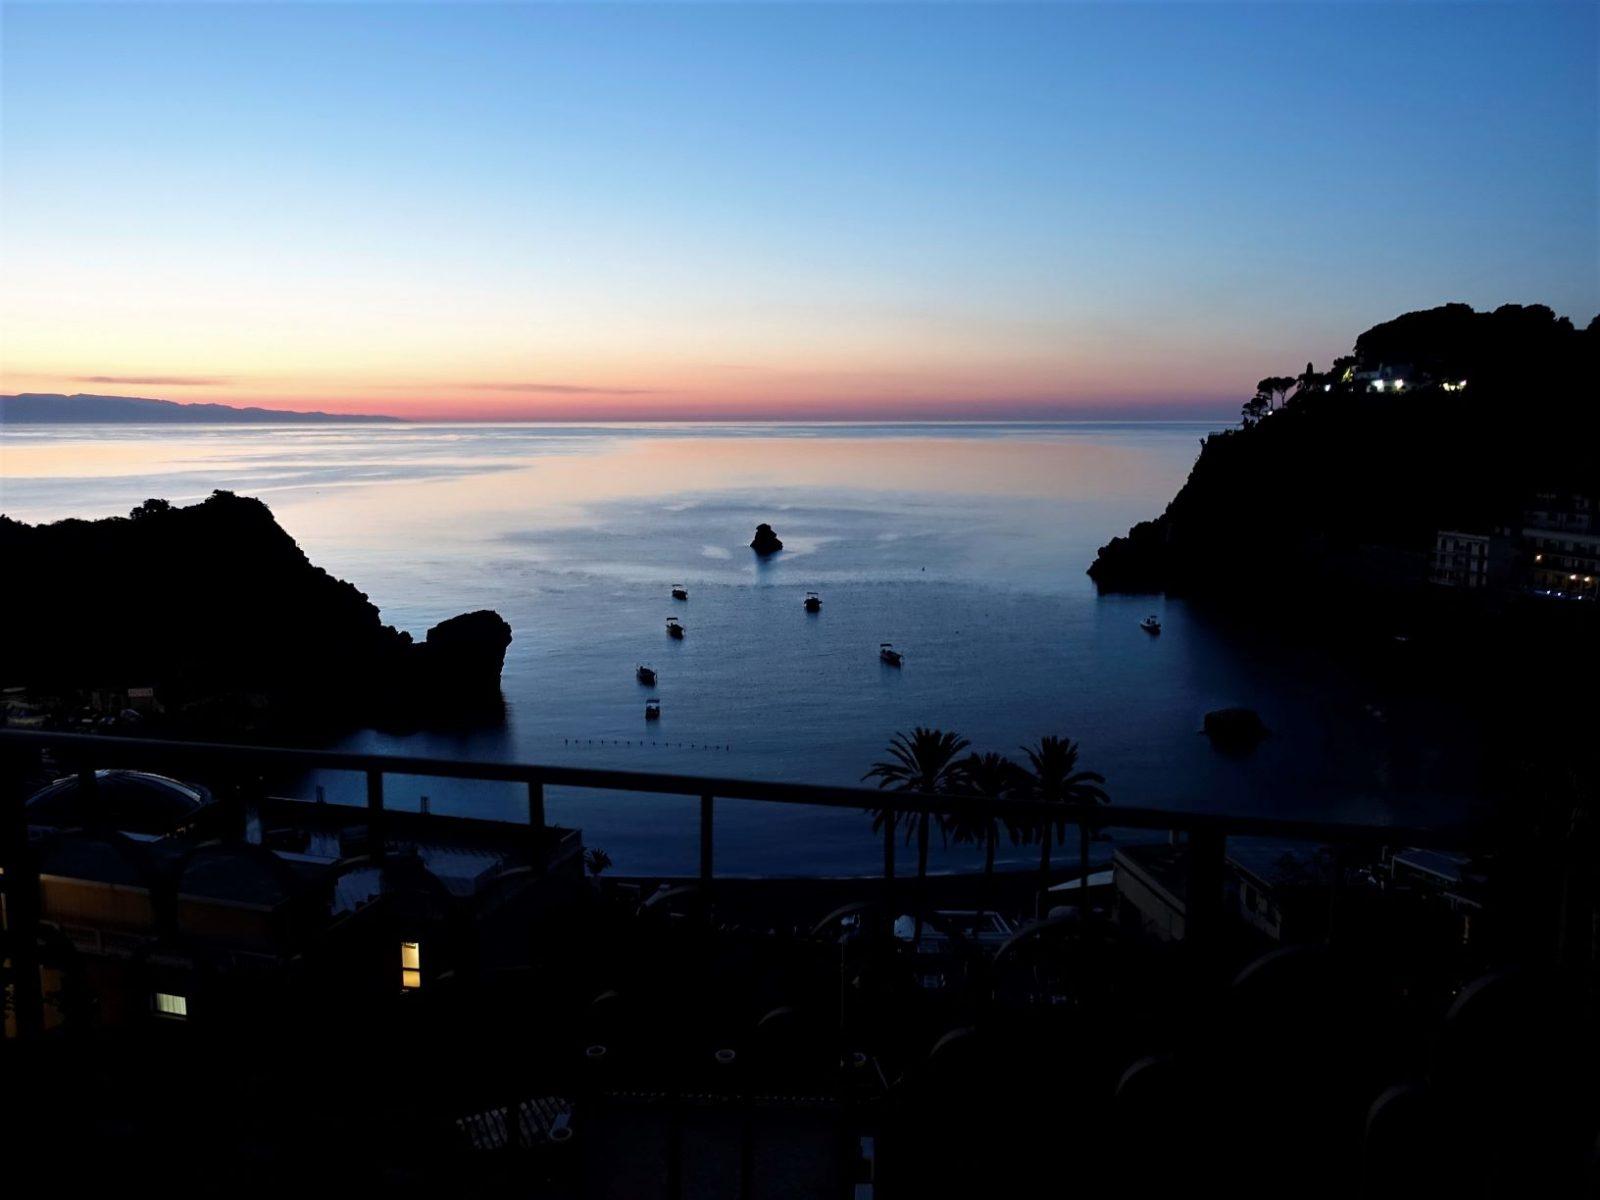 Solnedgang fra balkongen i Taormina Sicilia